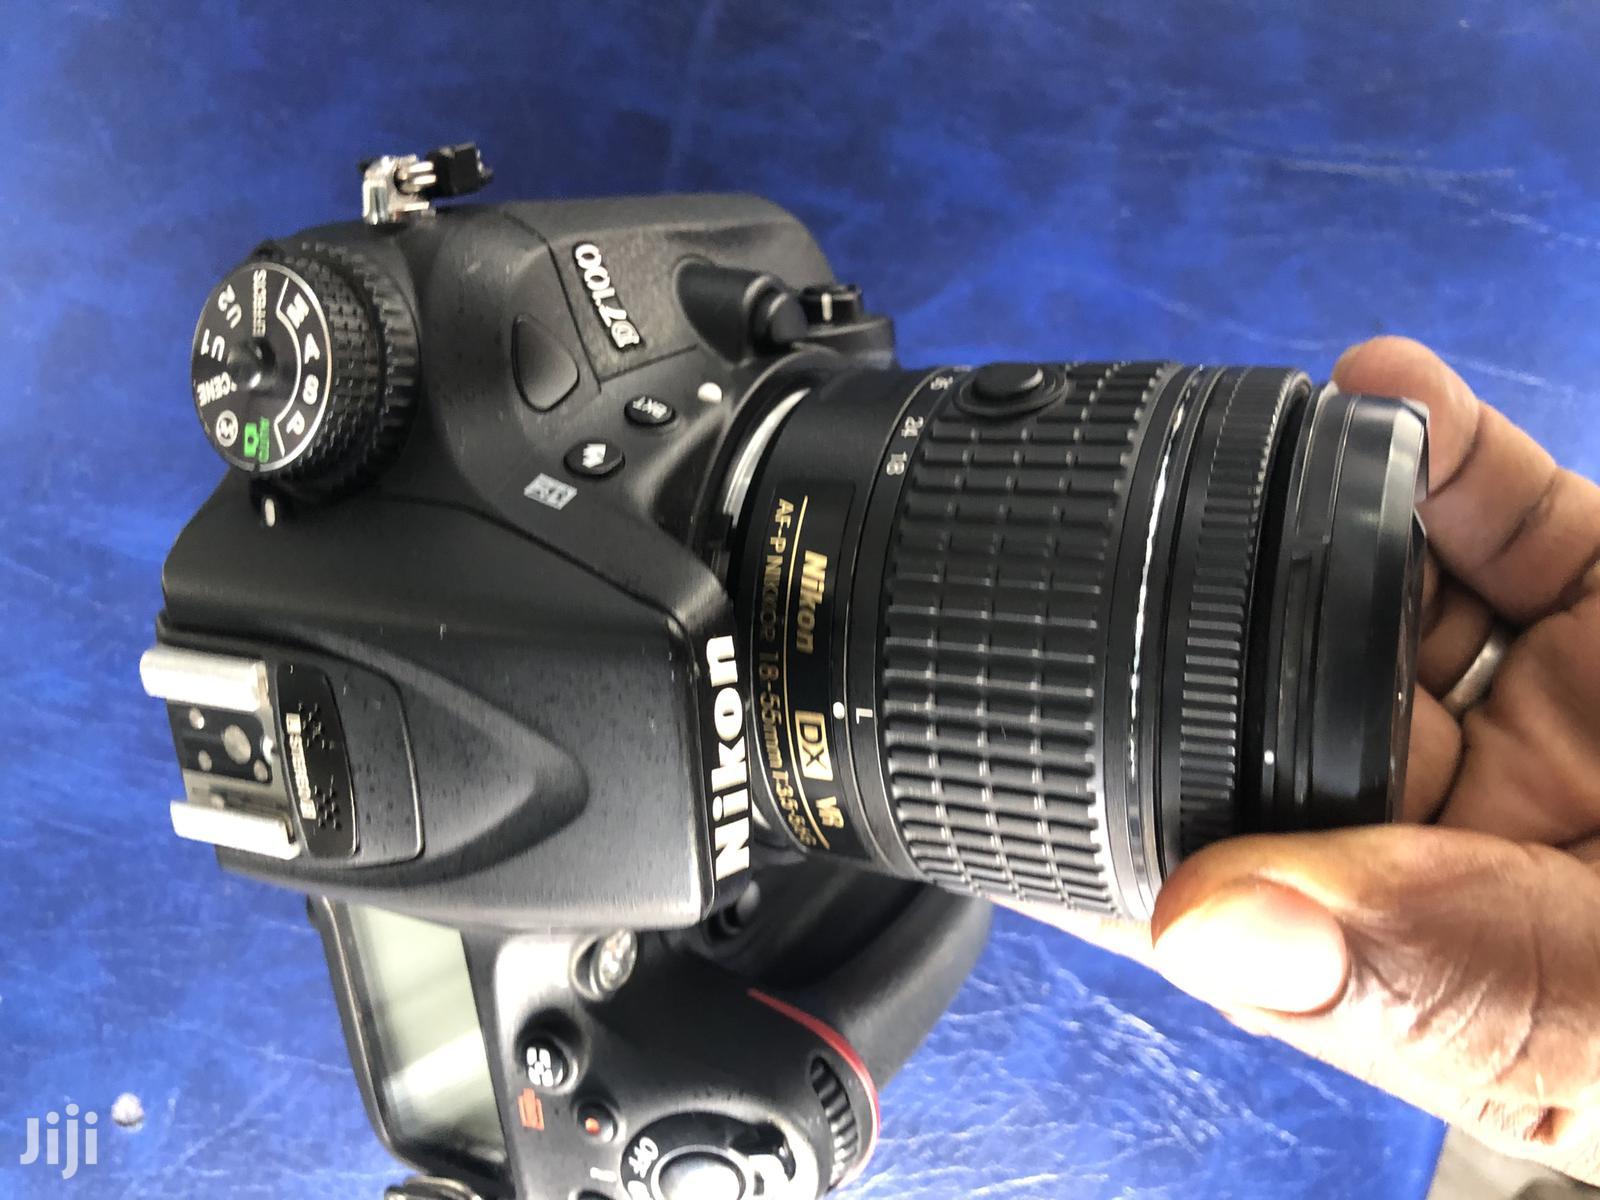 Nikon 70001 Very Net Camera as U.K Use. | Photo & Video Cameras for sale in Kokomlemle, Greater Accra, Ghana